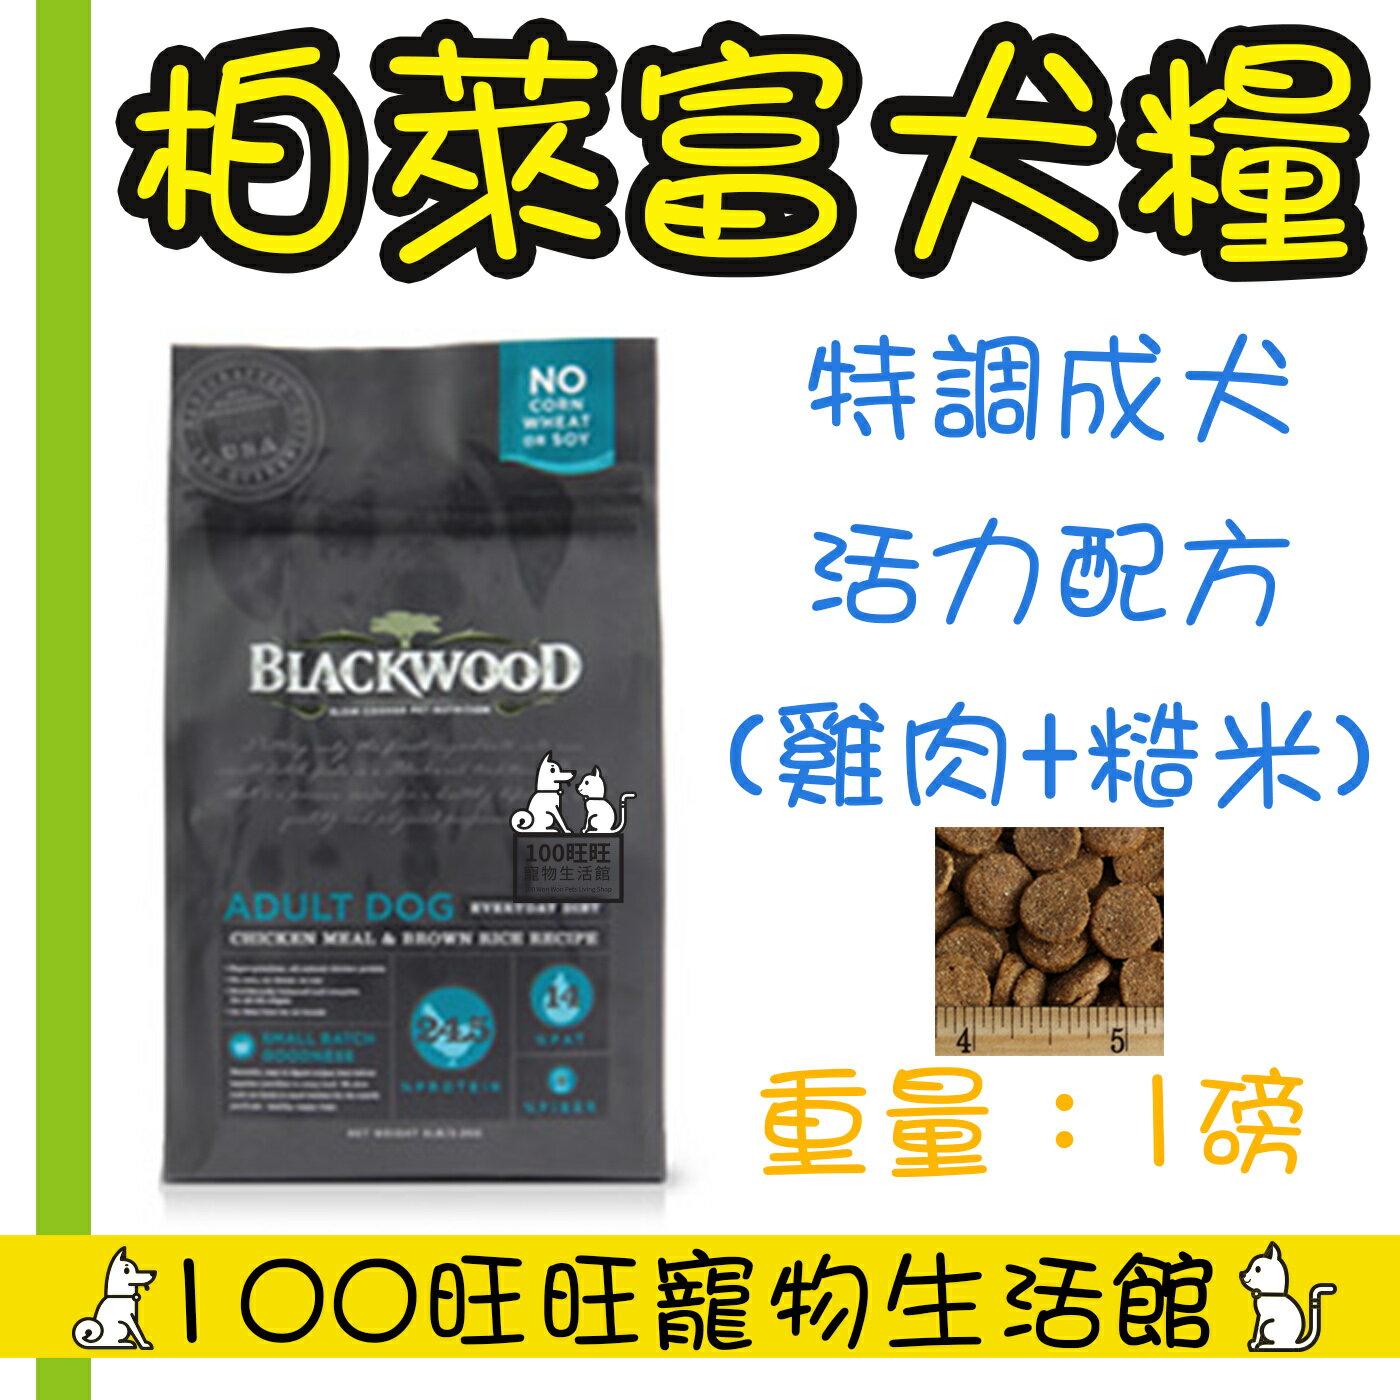 BLACKWOOD 柏萊富 特調成犬 活力配方 1lb (雞肉+糙米) 450g